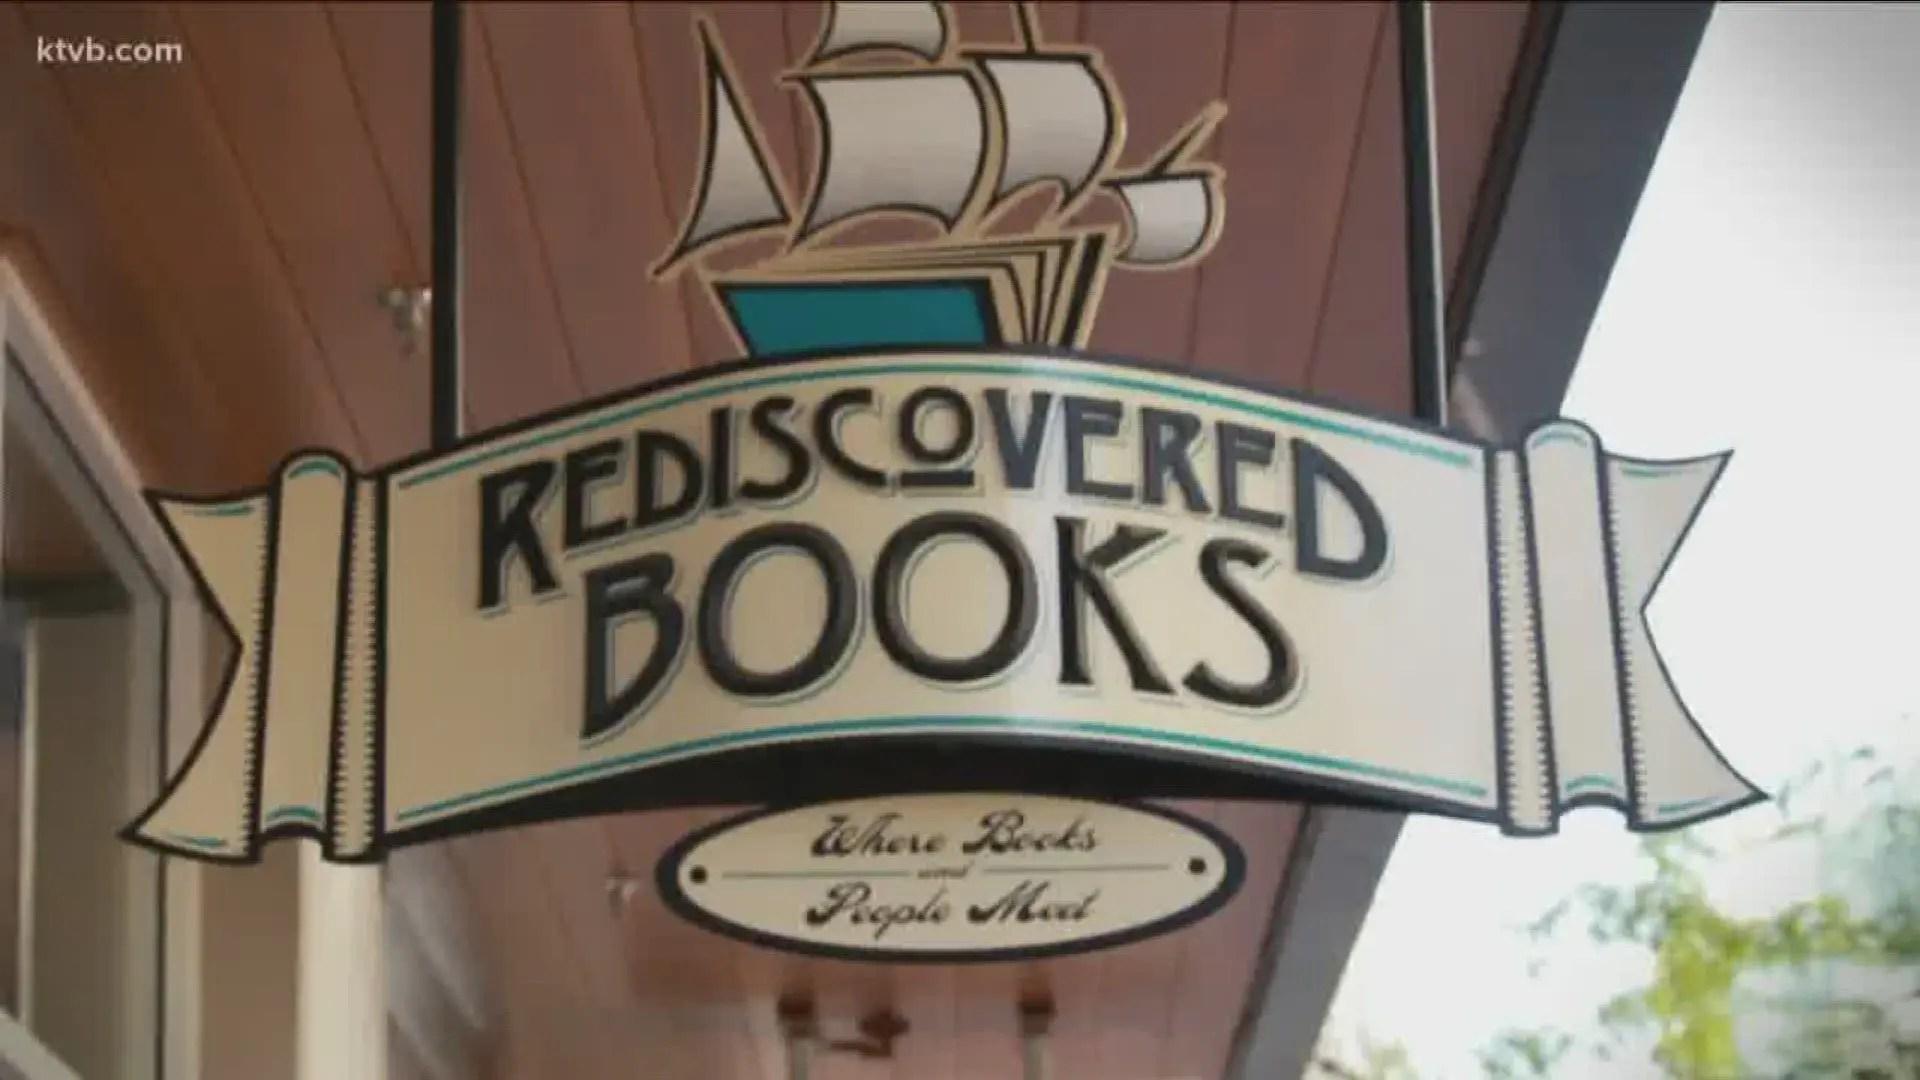 Rediscovered Books